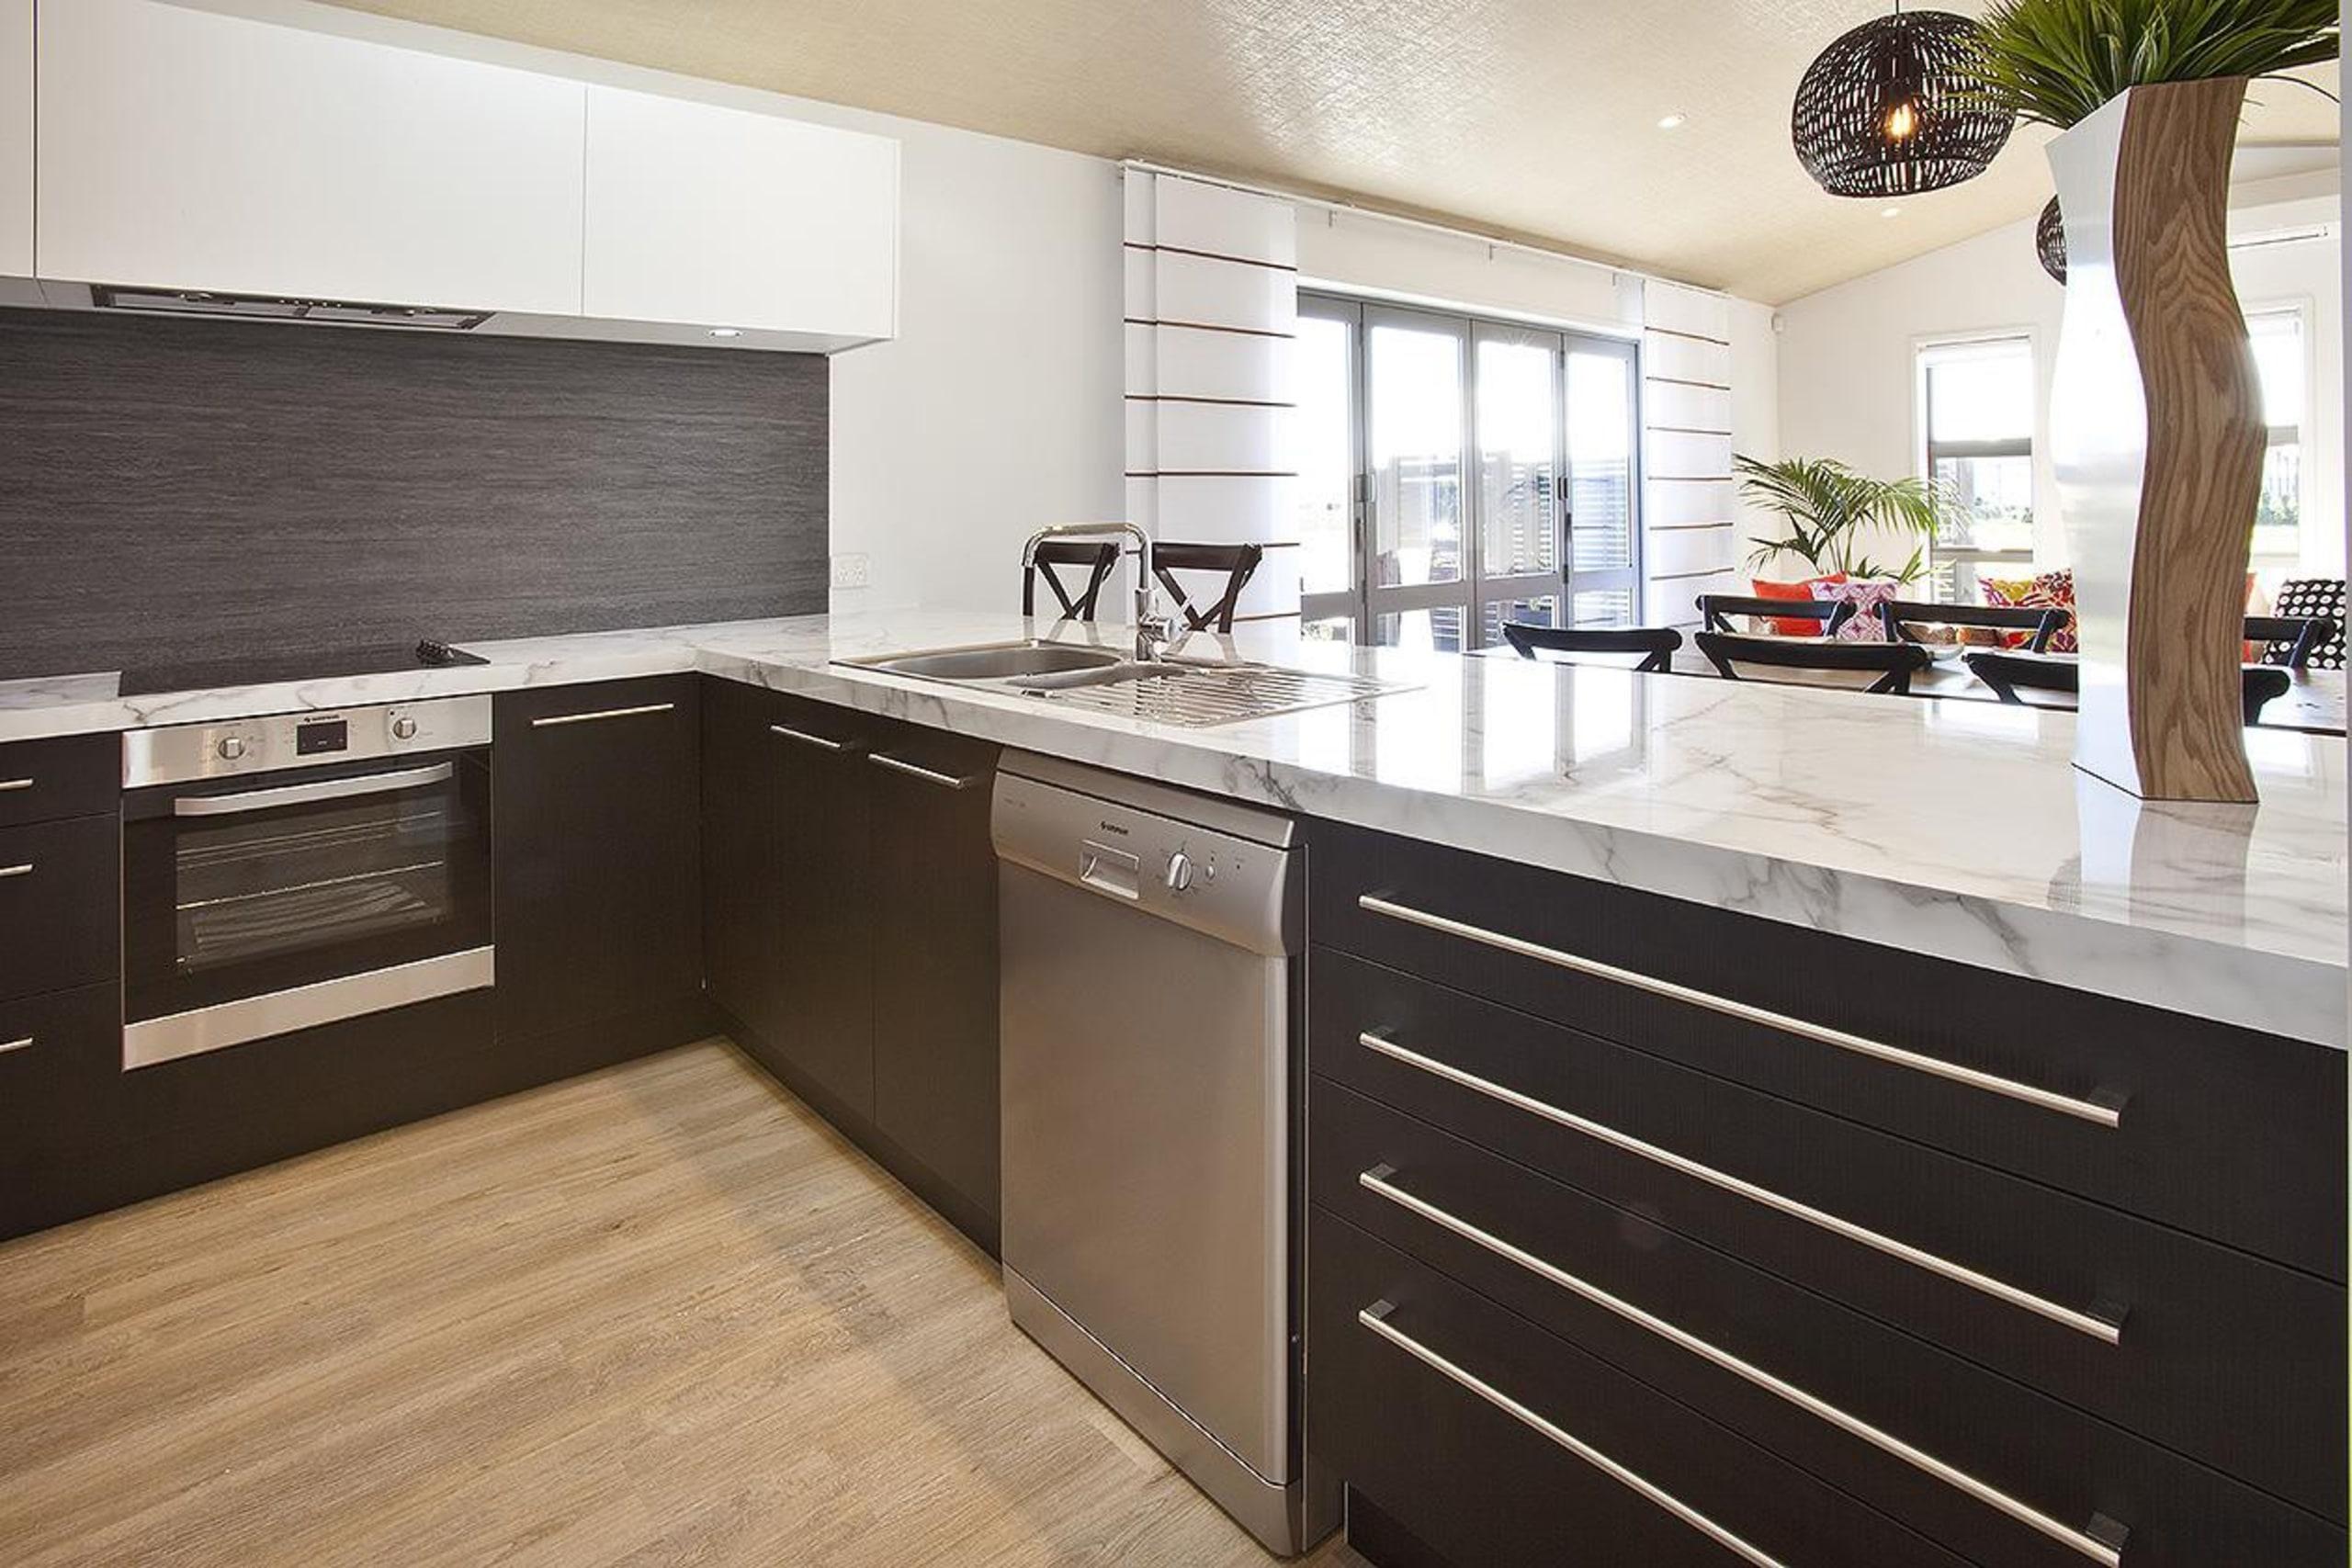 For more information, please visit www.gjgardner.co.nz cabinetry, countertop, cuisine classique, floor, interior design, kitchen, real estate, white, black